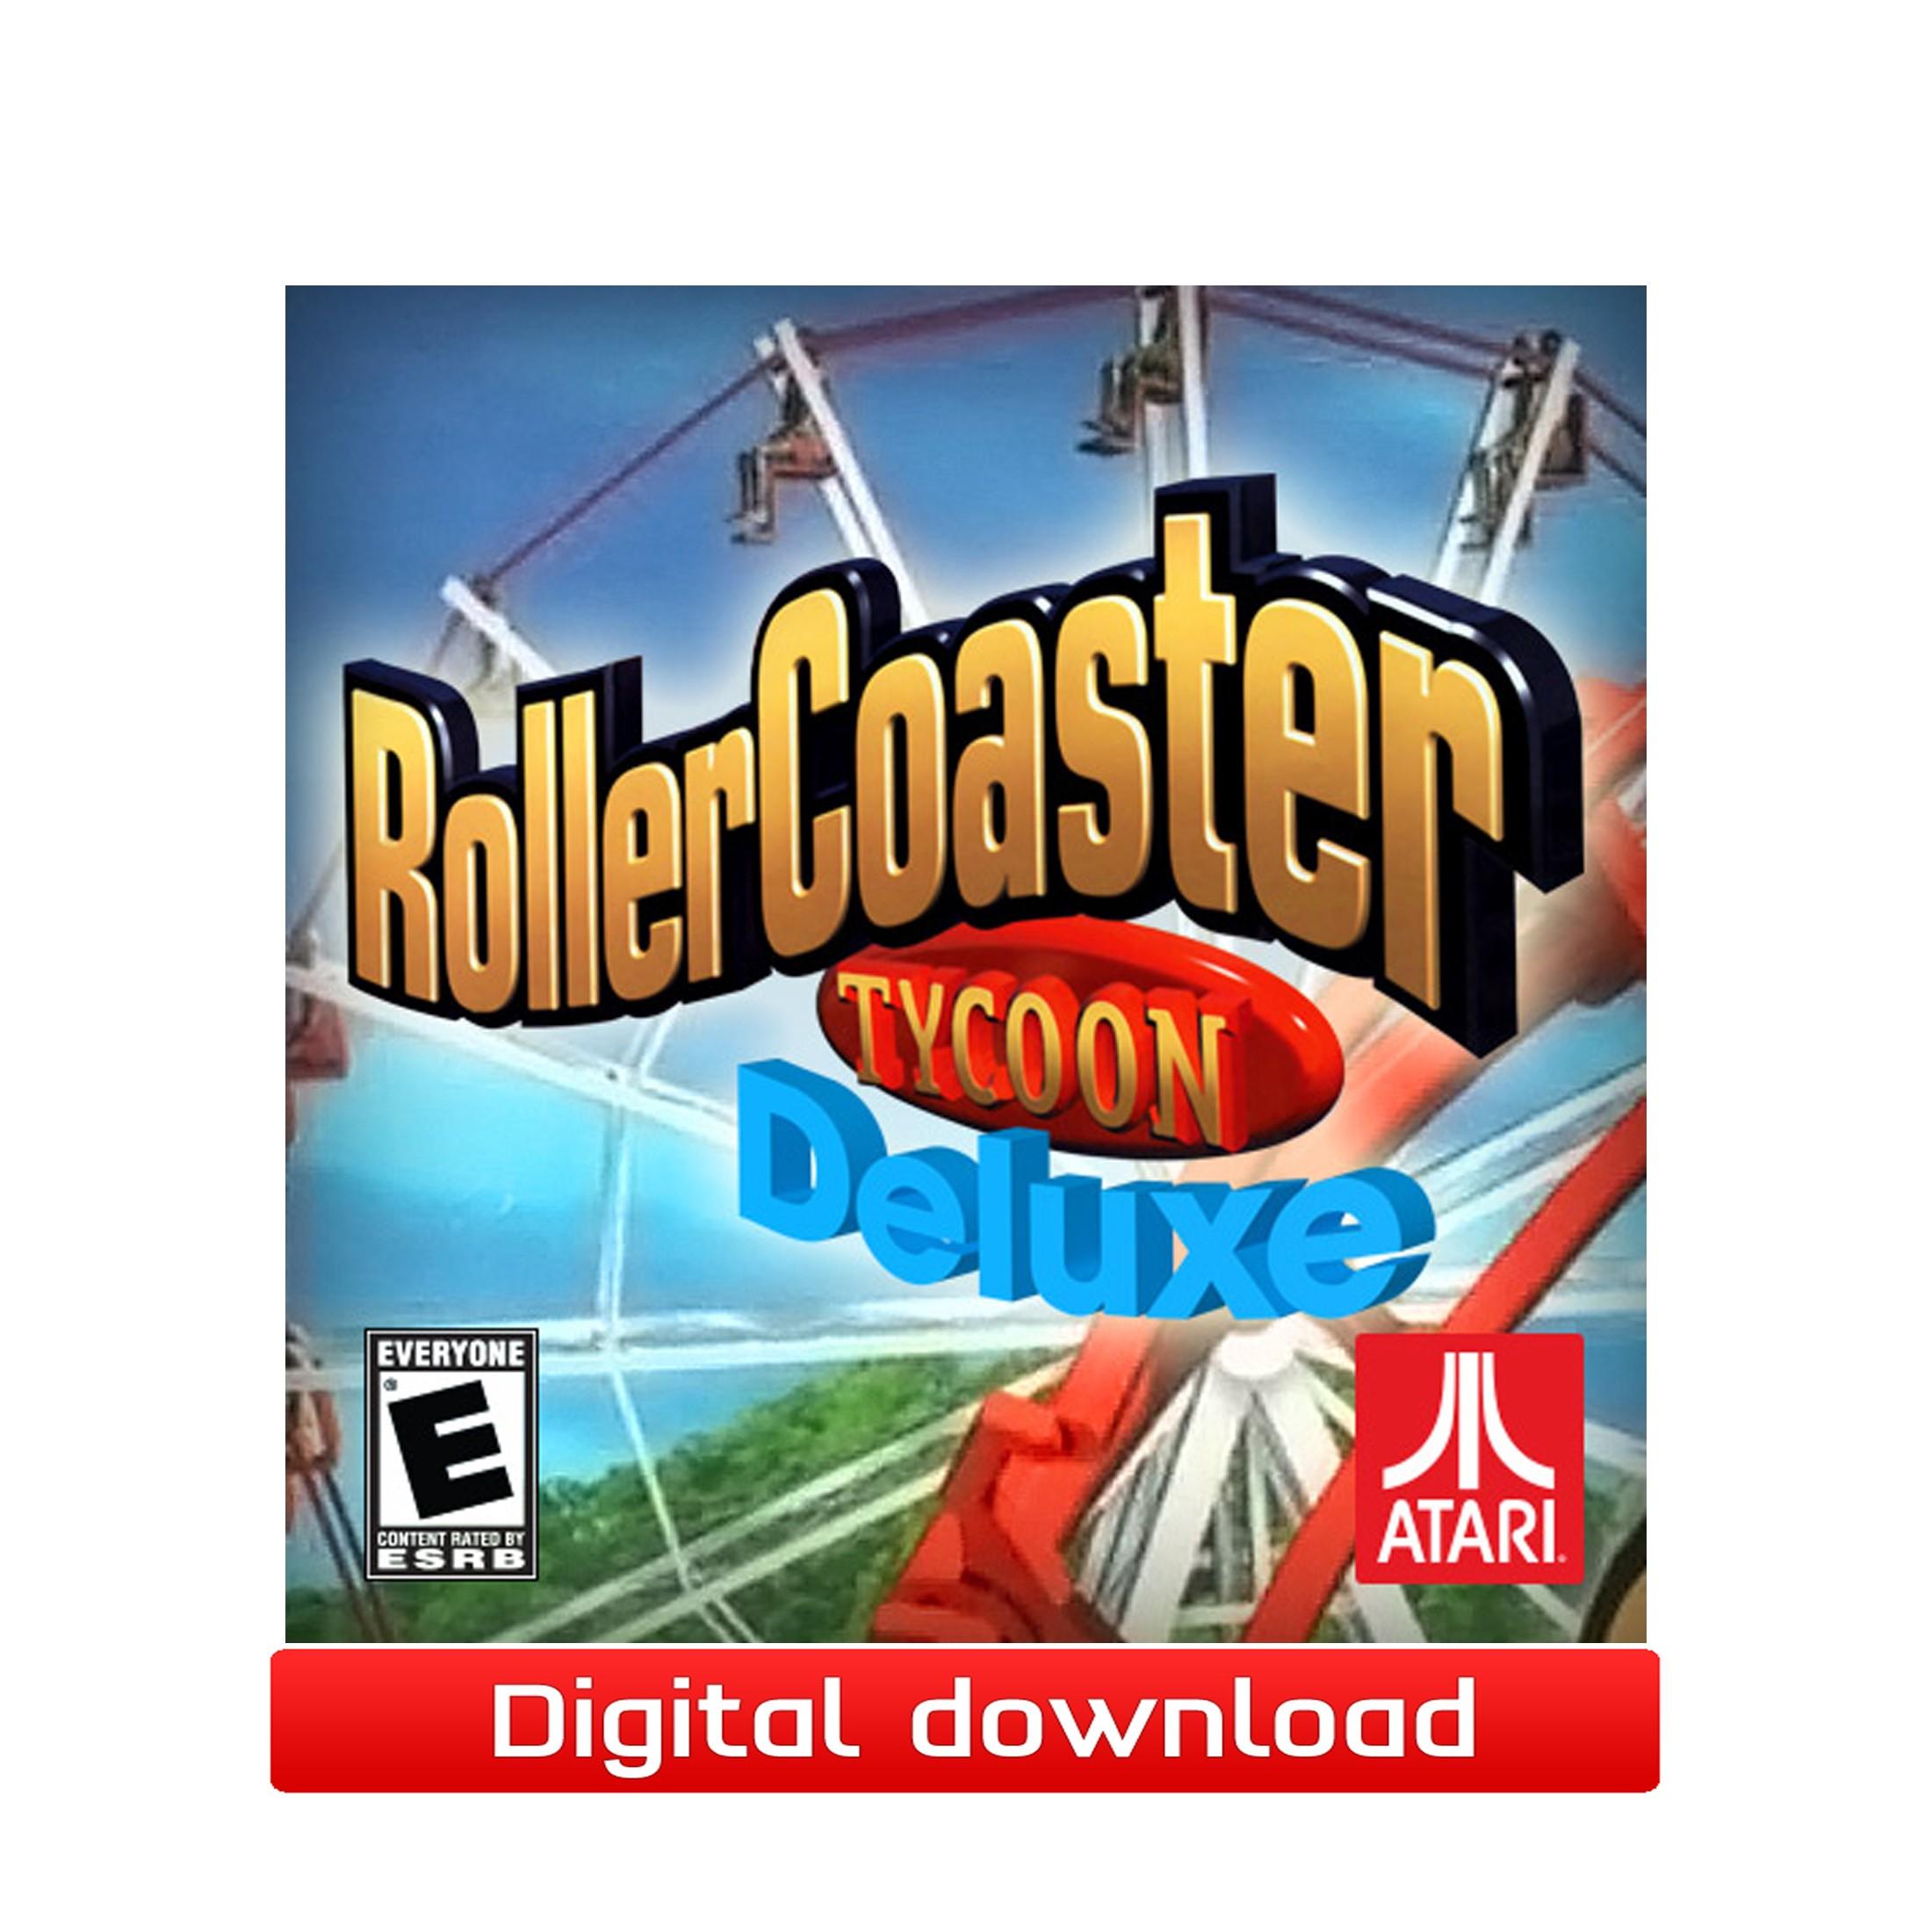 37174 : RollerCoaster Tycoon Deluxe (PC nedlastning)